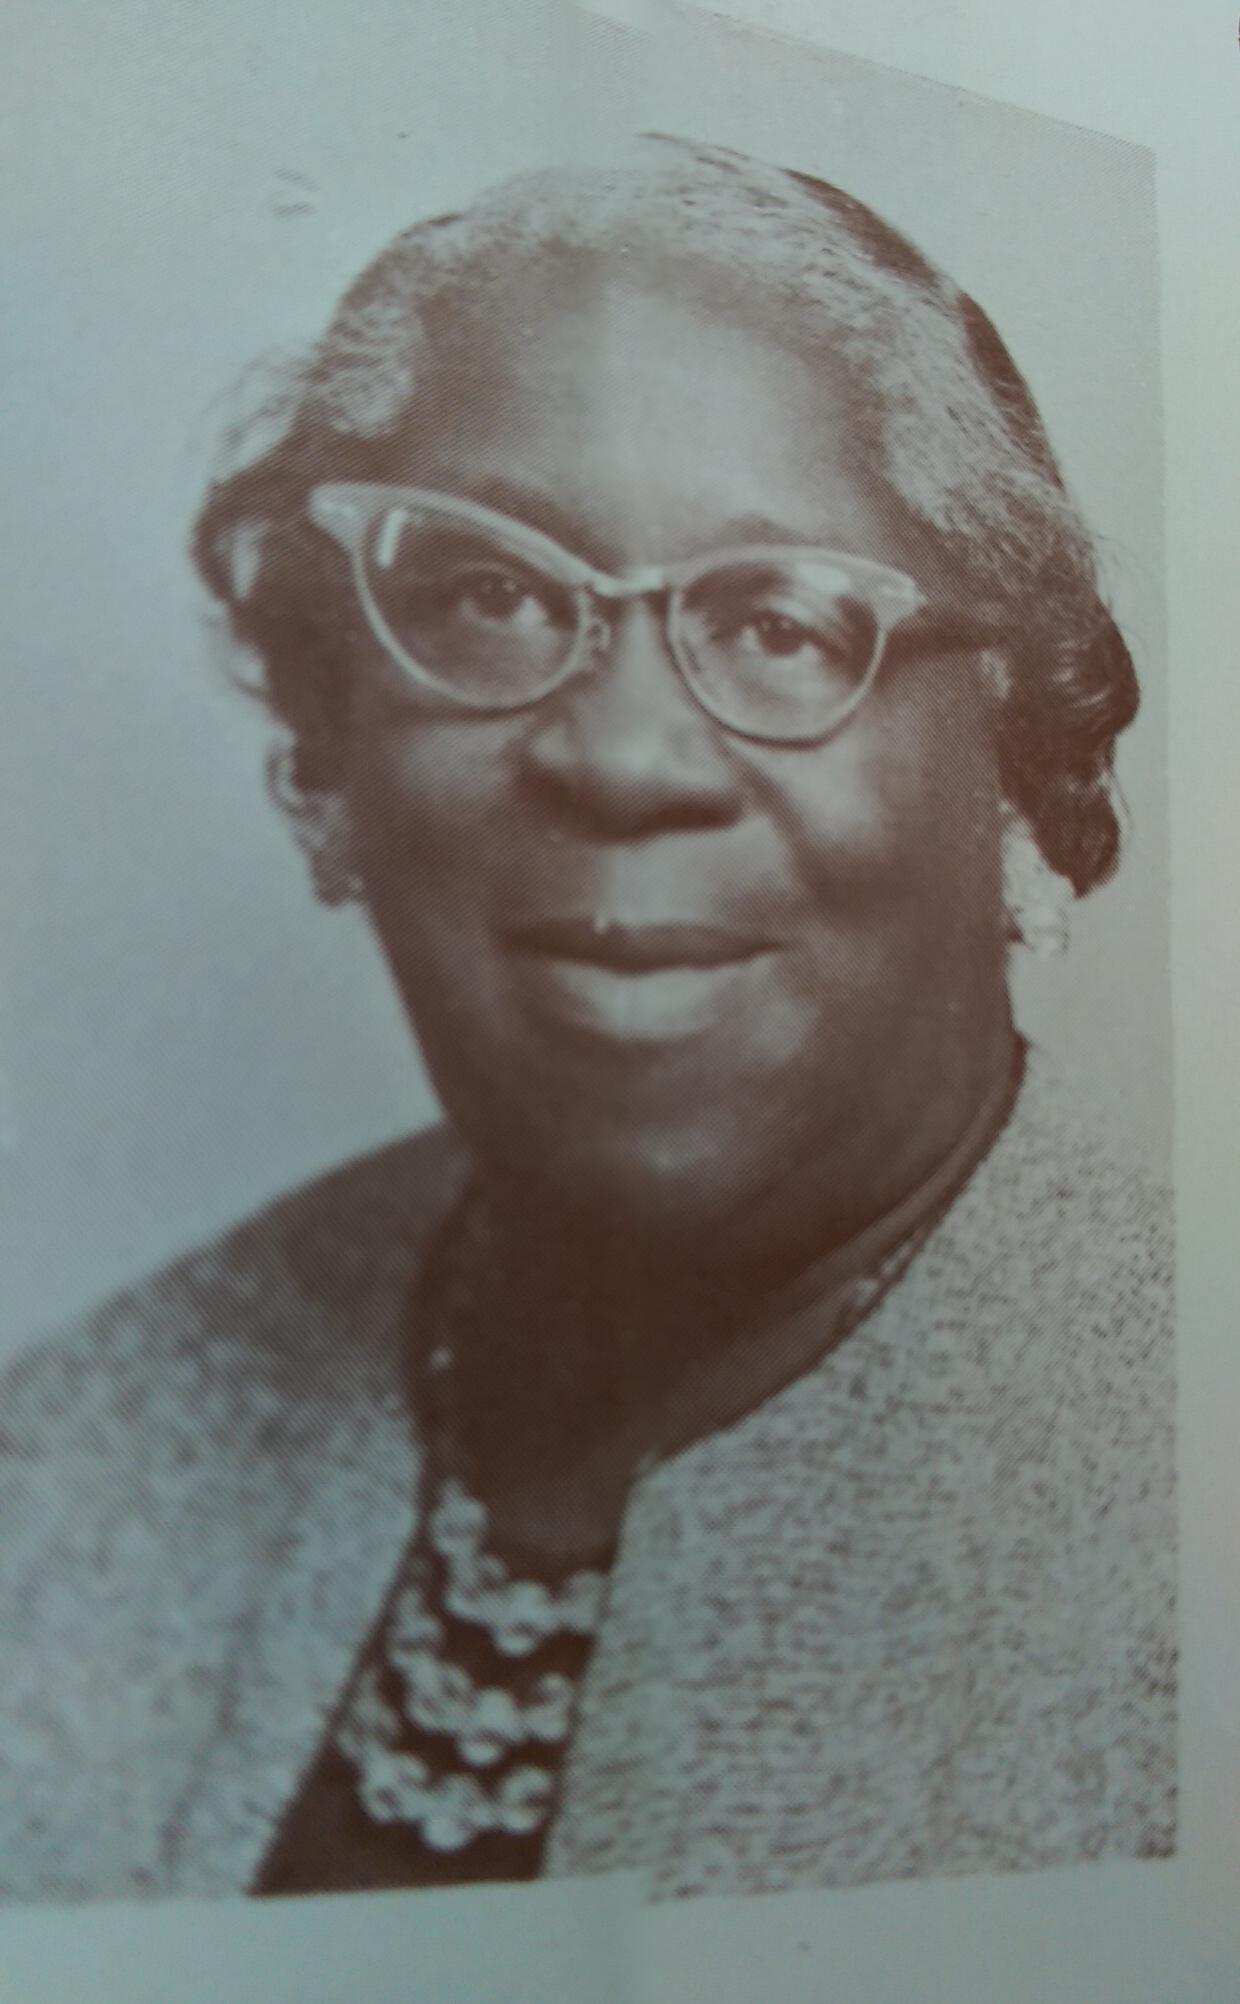 Blanche Hardman